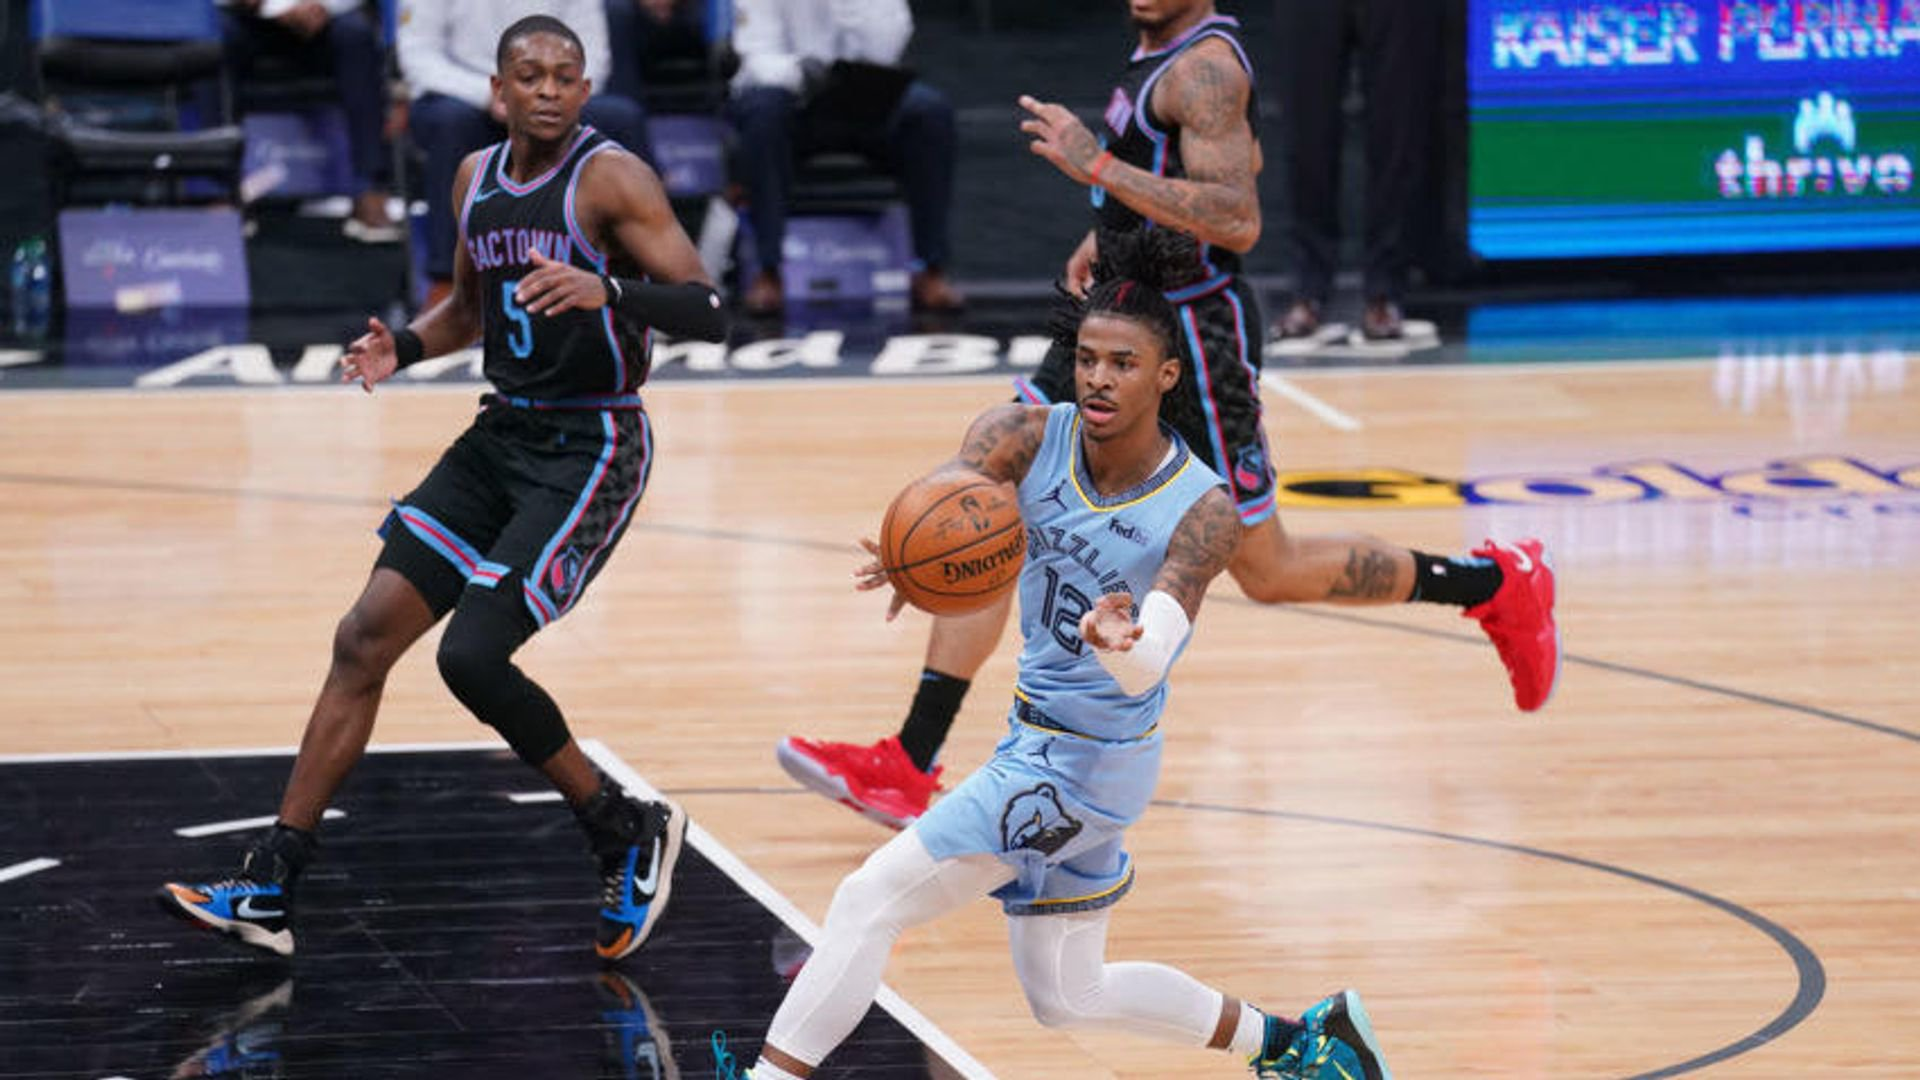 Memphis and Washington Looking to Extend 4-1 ATS Runs as NBA Second Half Opens Tonight